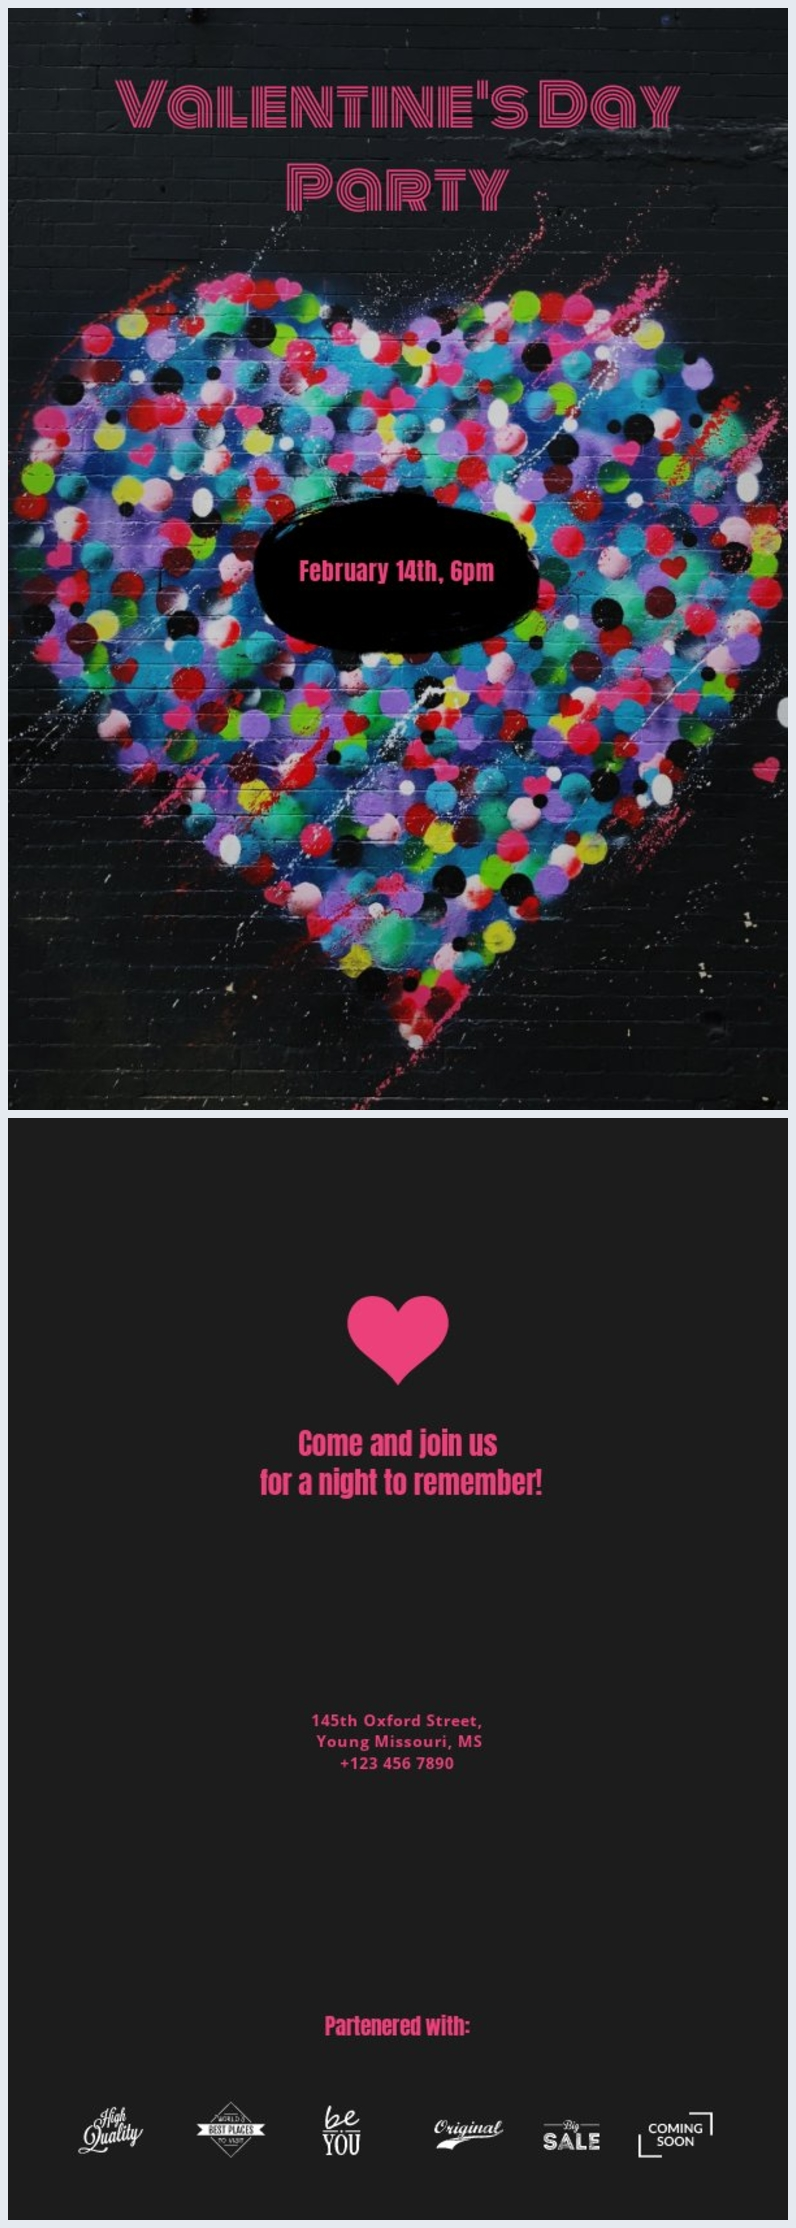 Valentinstags-Partyflyervorlage